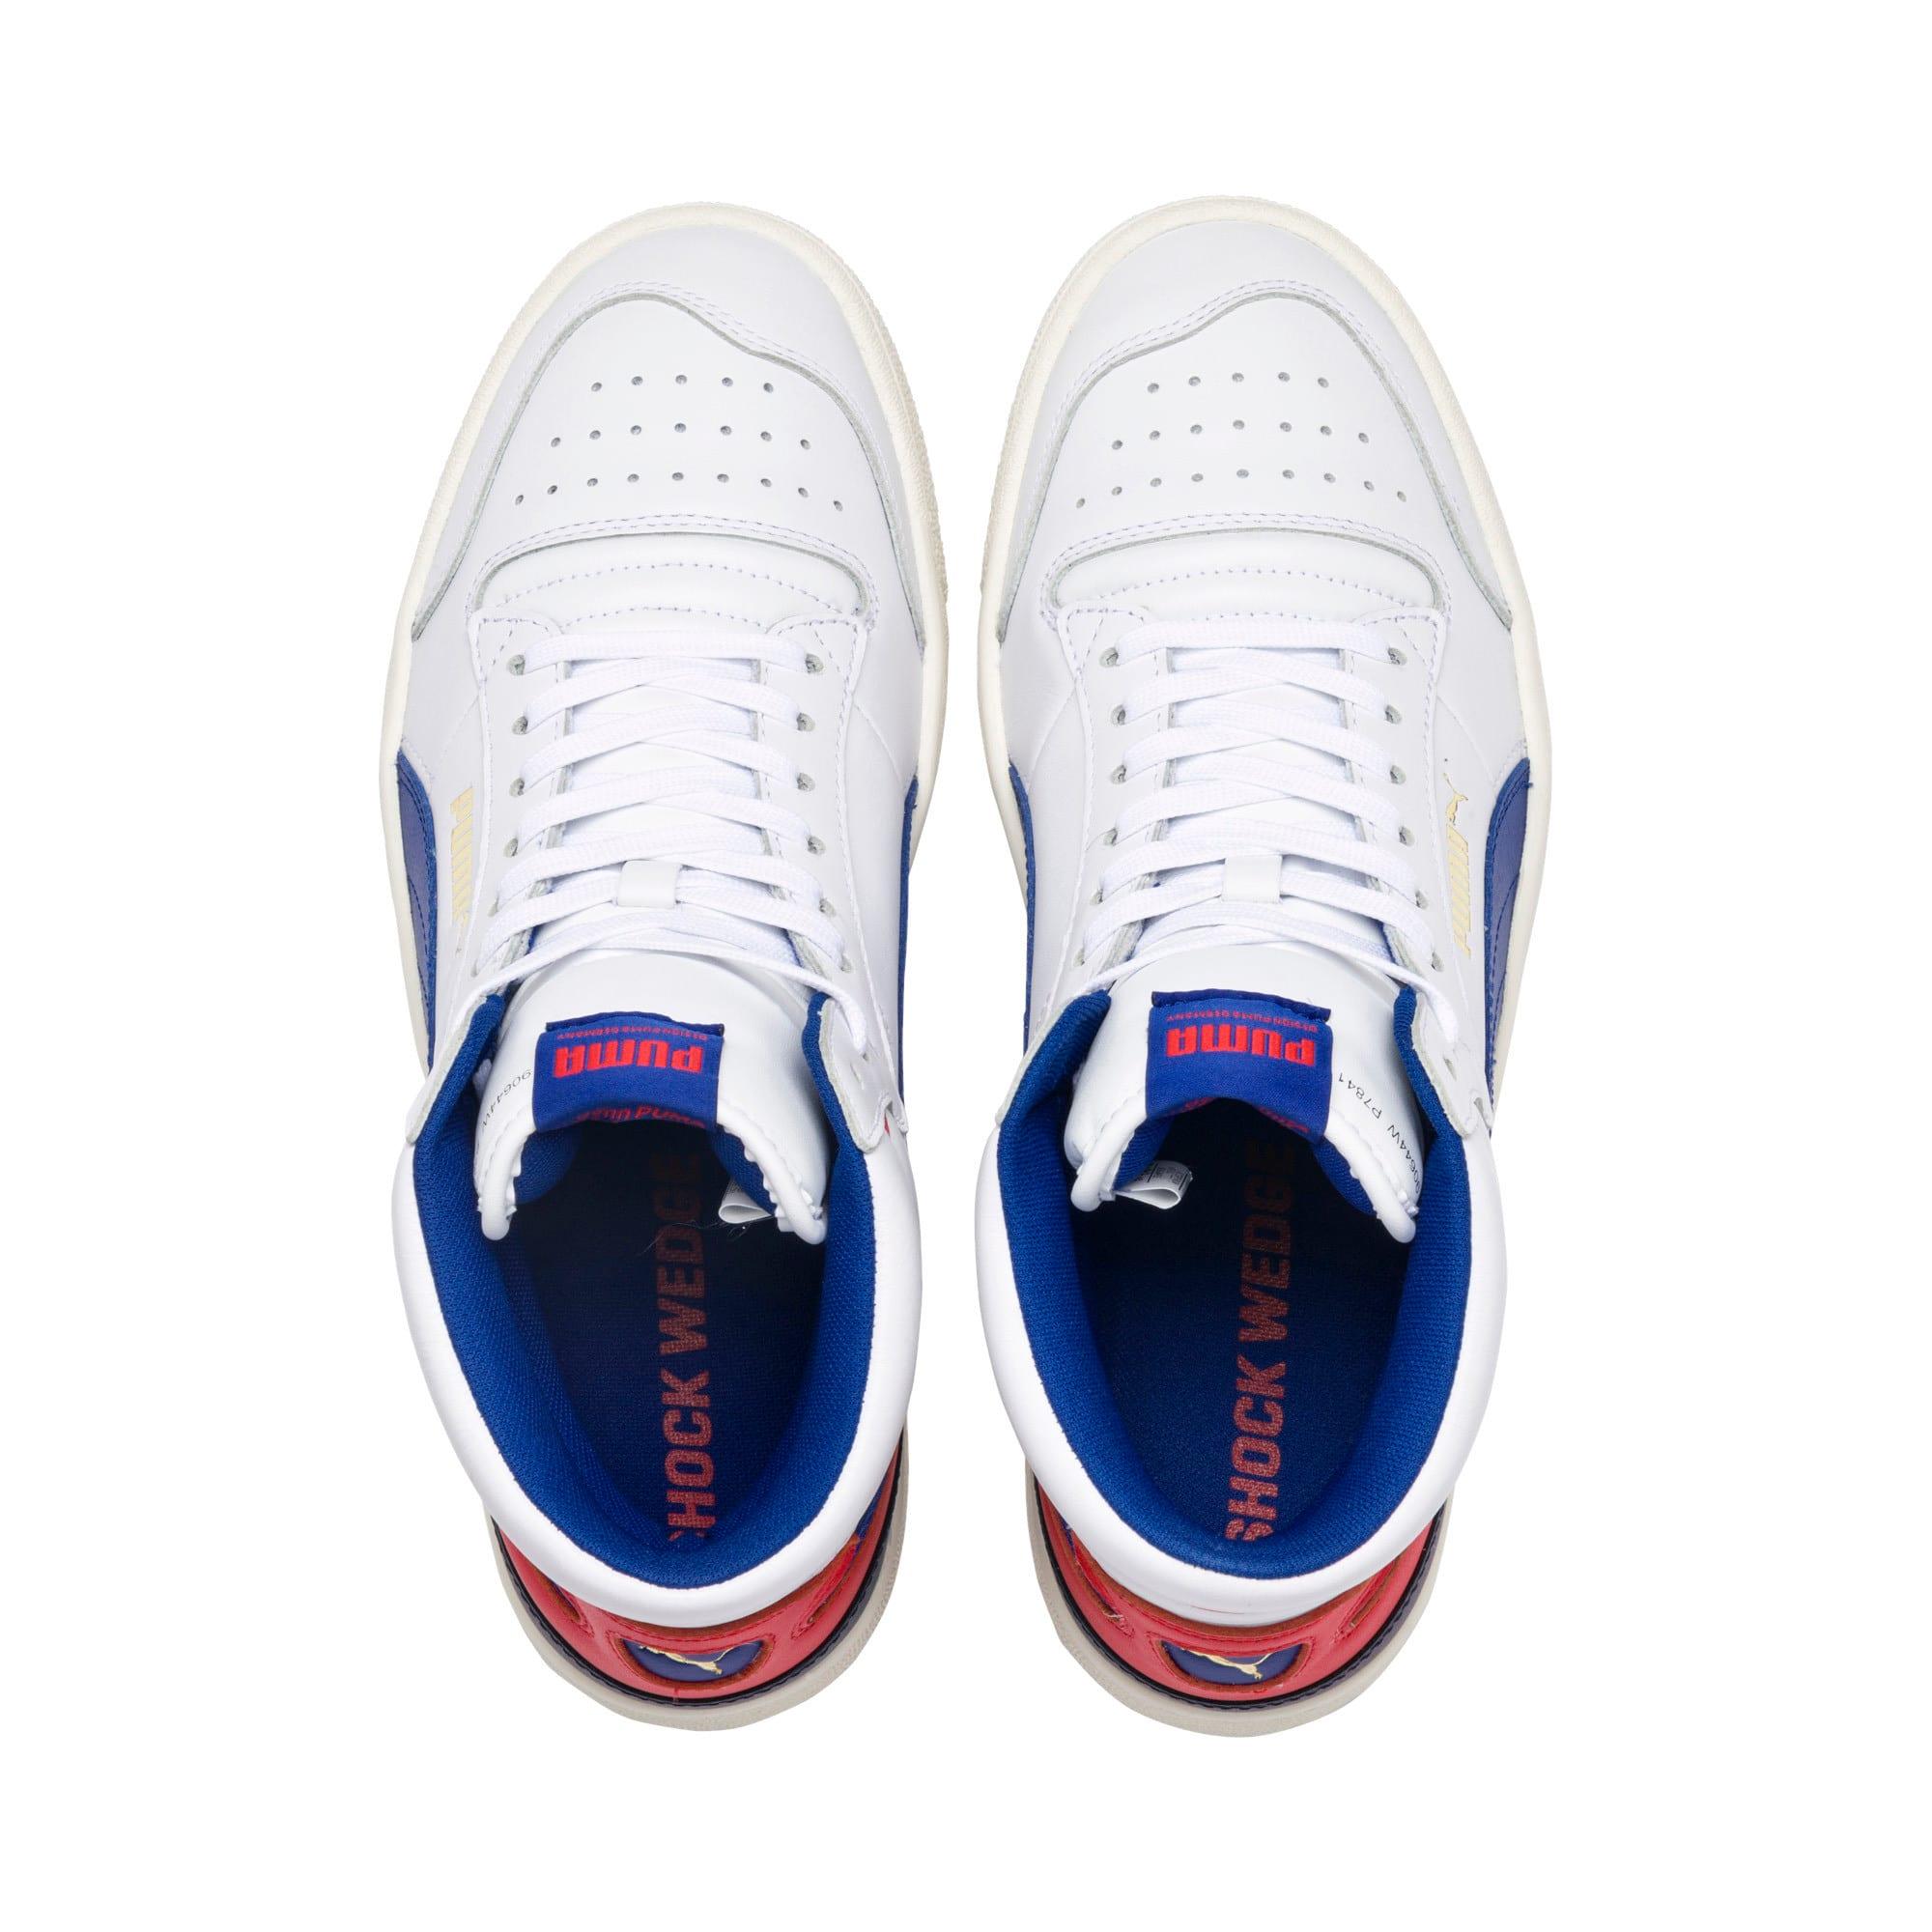 Thumbnail 6 of Ralph Sampson Mid Sneakers, Wht-Surf The Web-Marshmallow, medium